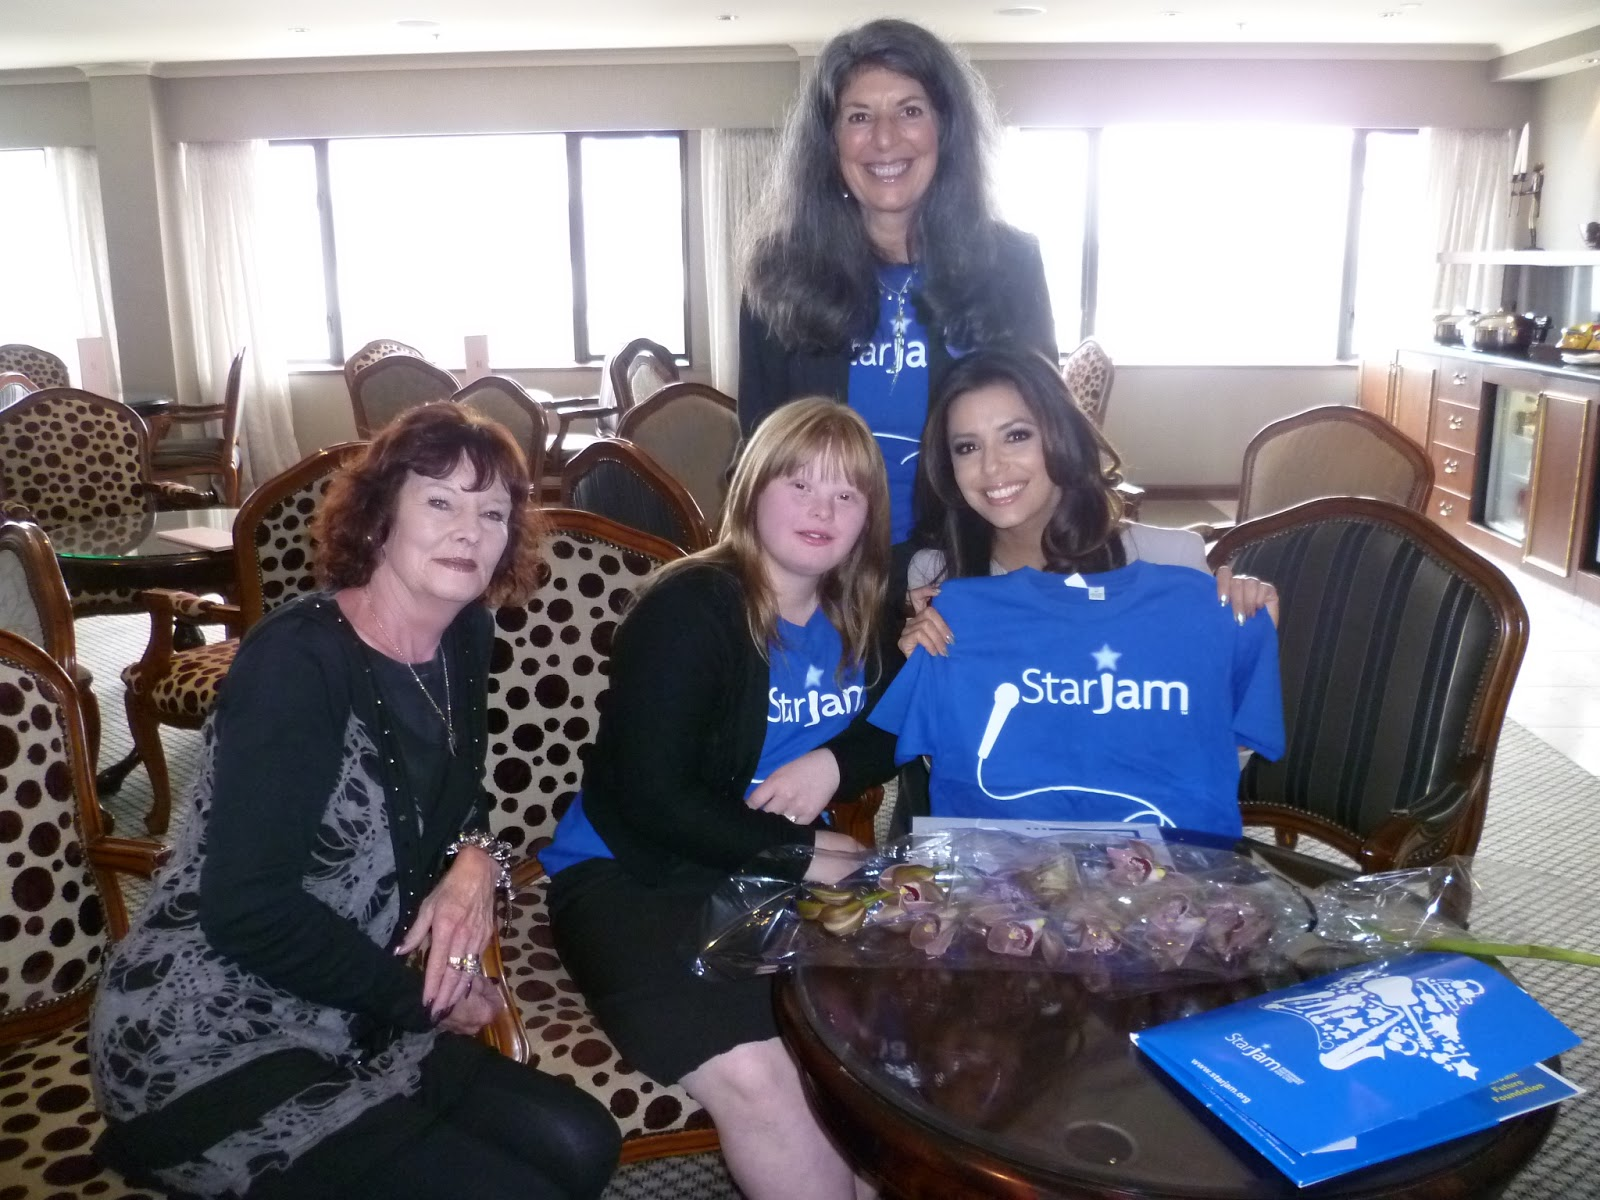 http://3.bp.blogspot.com/-8F1mX0c4X3o/UHeFquq3c9I/AAAAAAAAA8c/q8fh0Q0KsTo/s1600/Eva+and+Brooke\'s+meeting.JPG